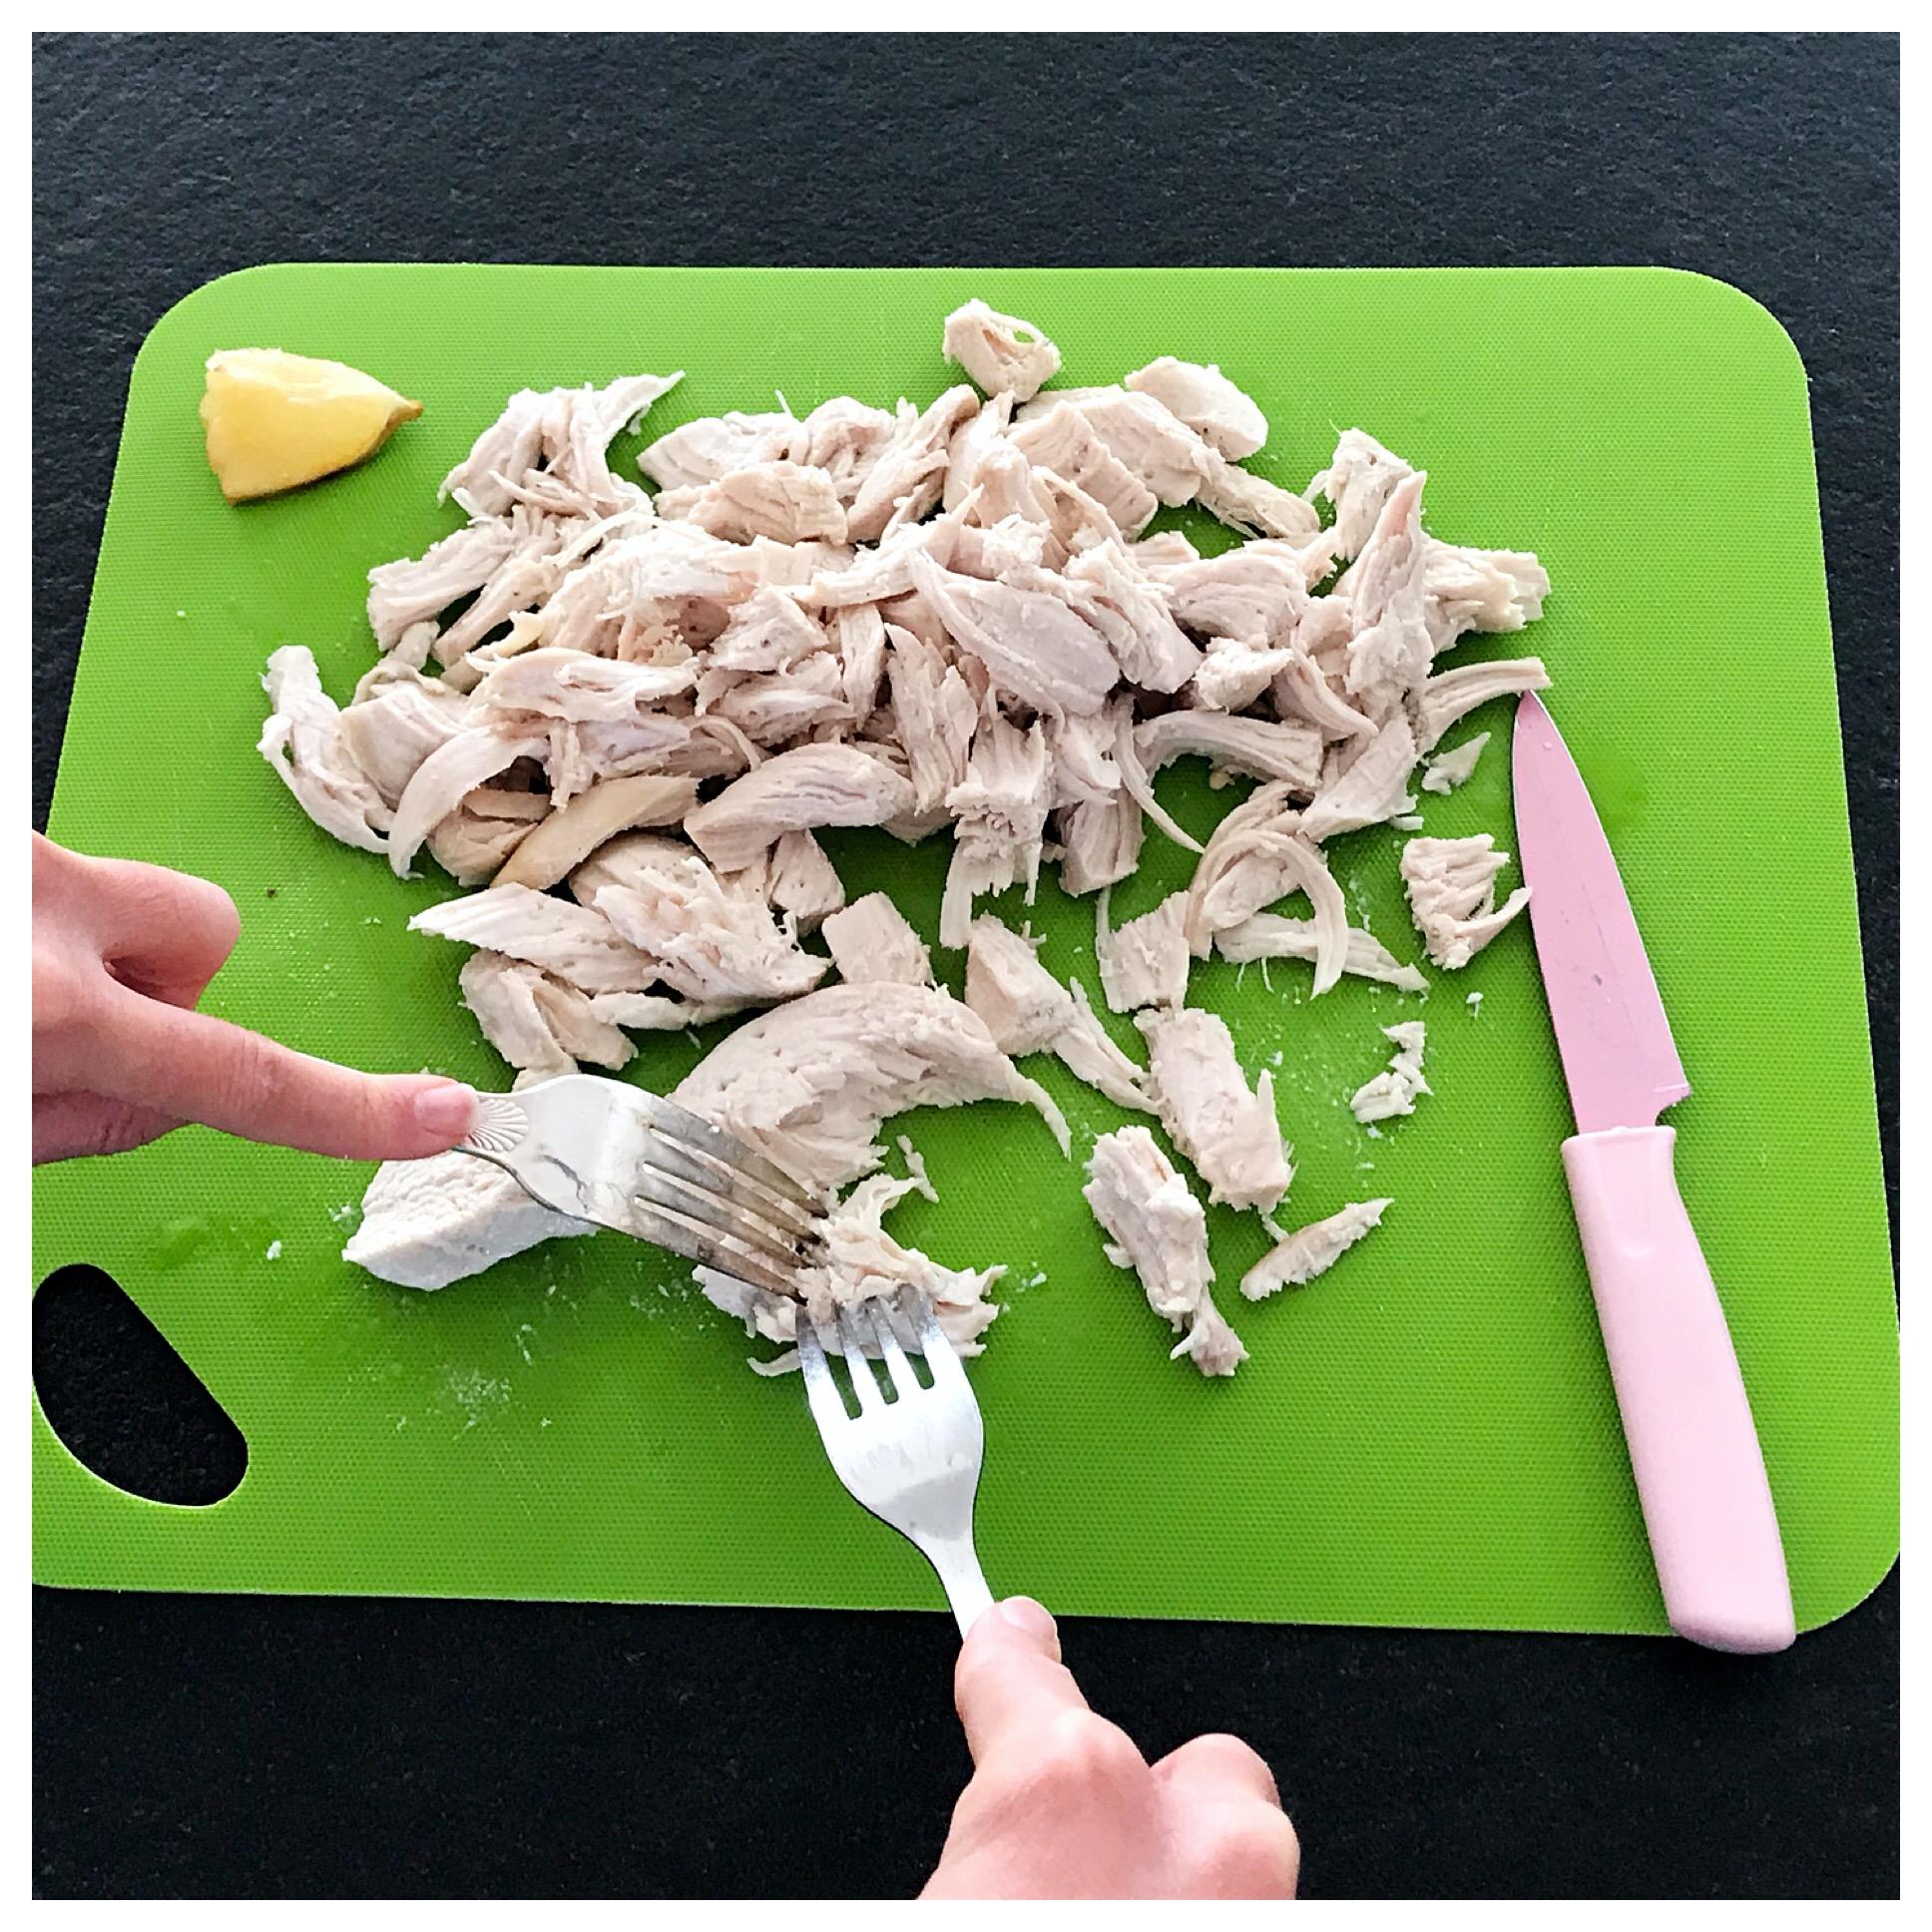 Shredded ChickenJPG.JPG